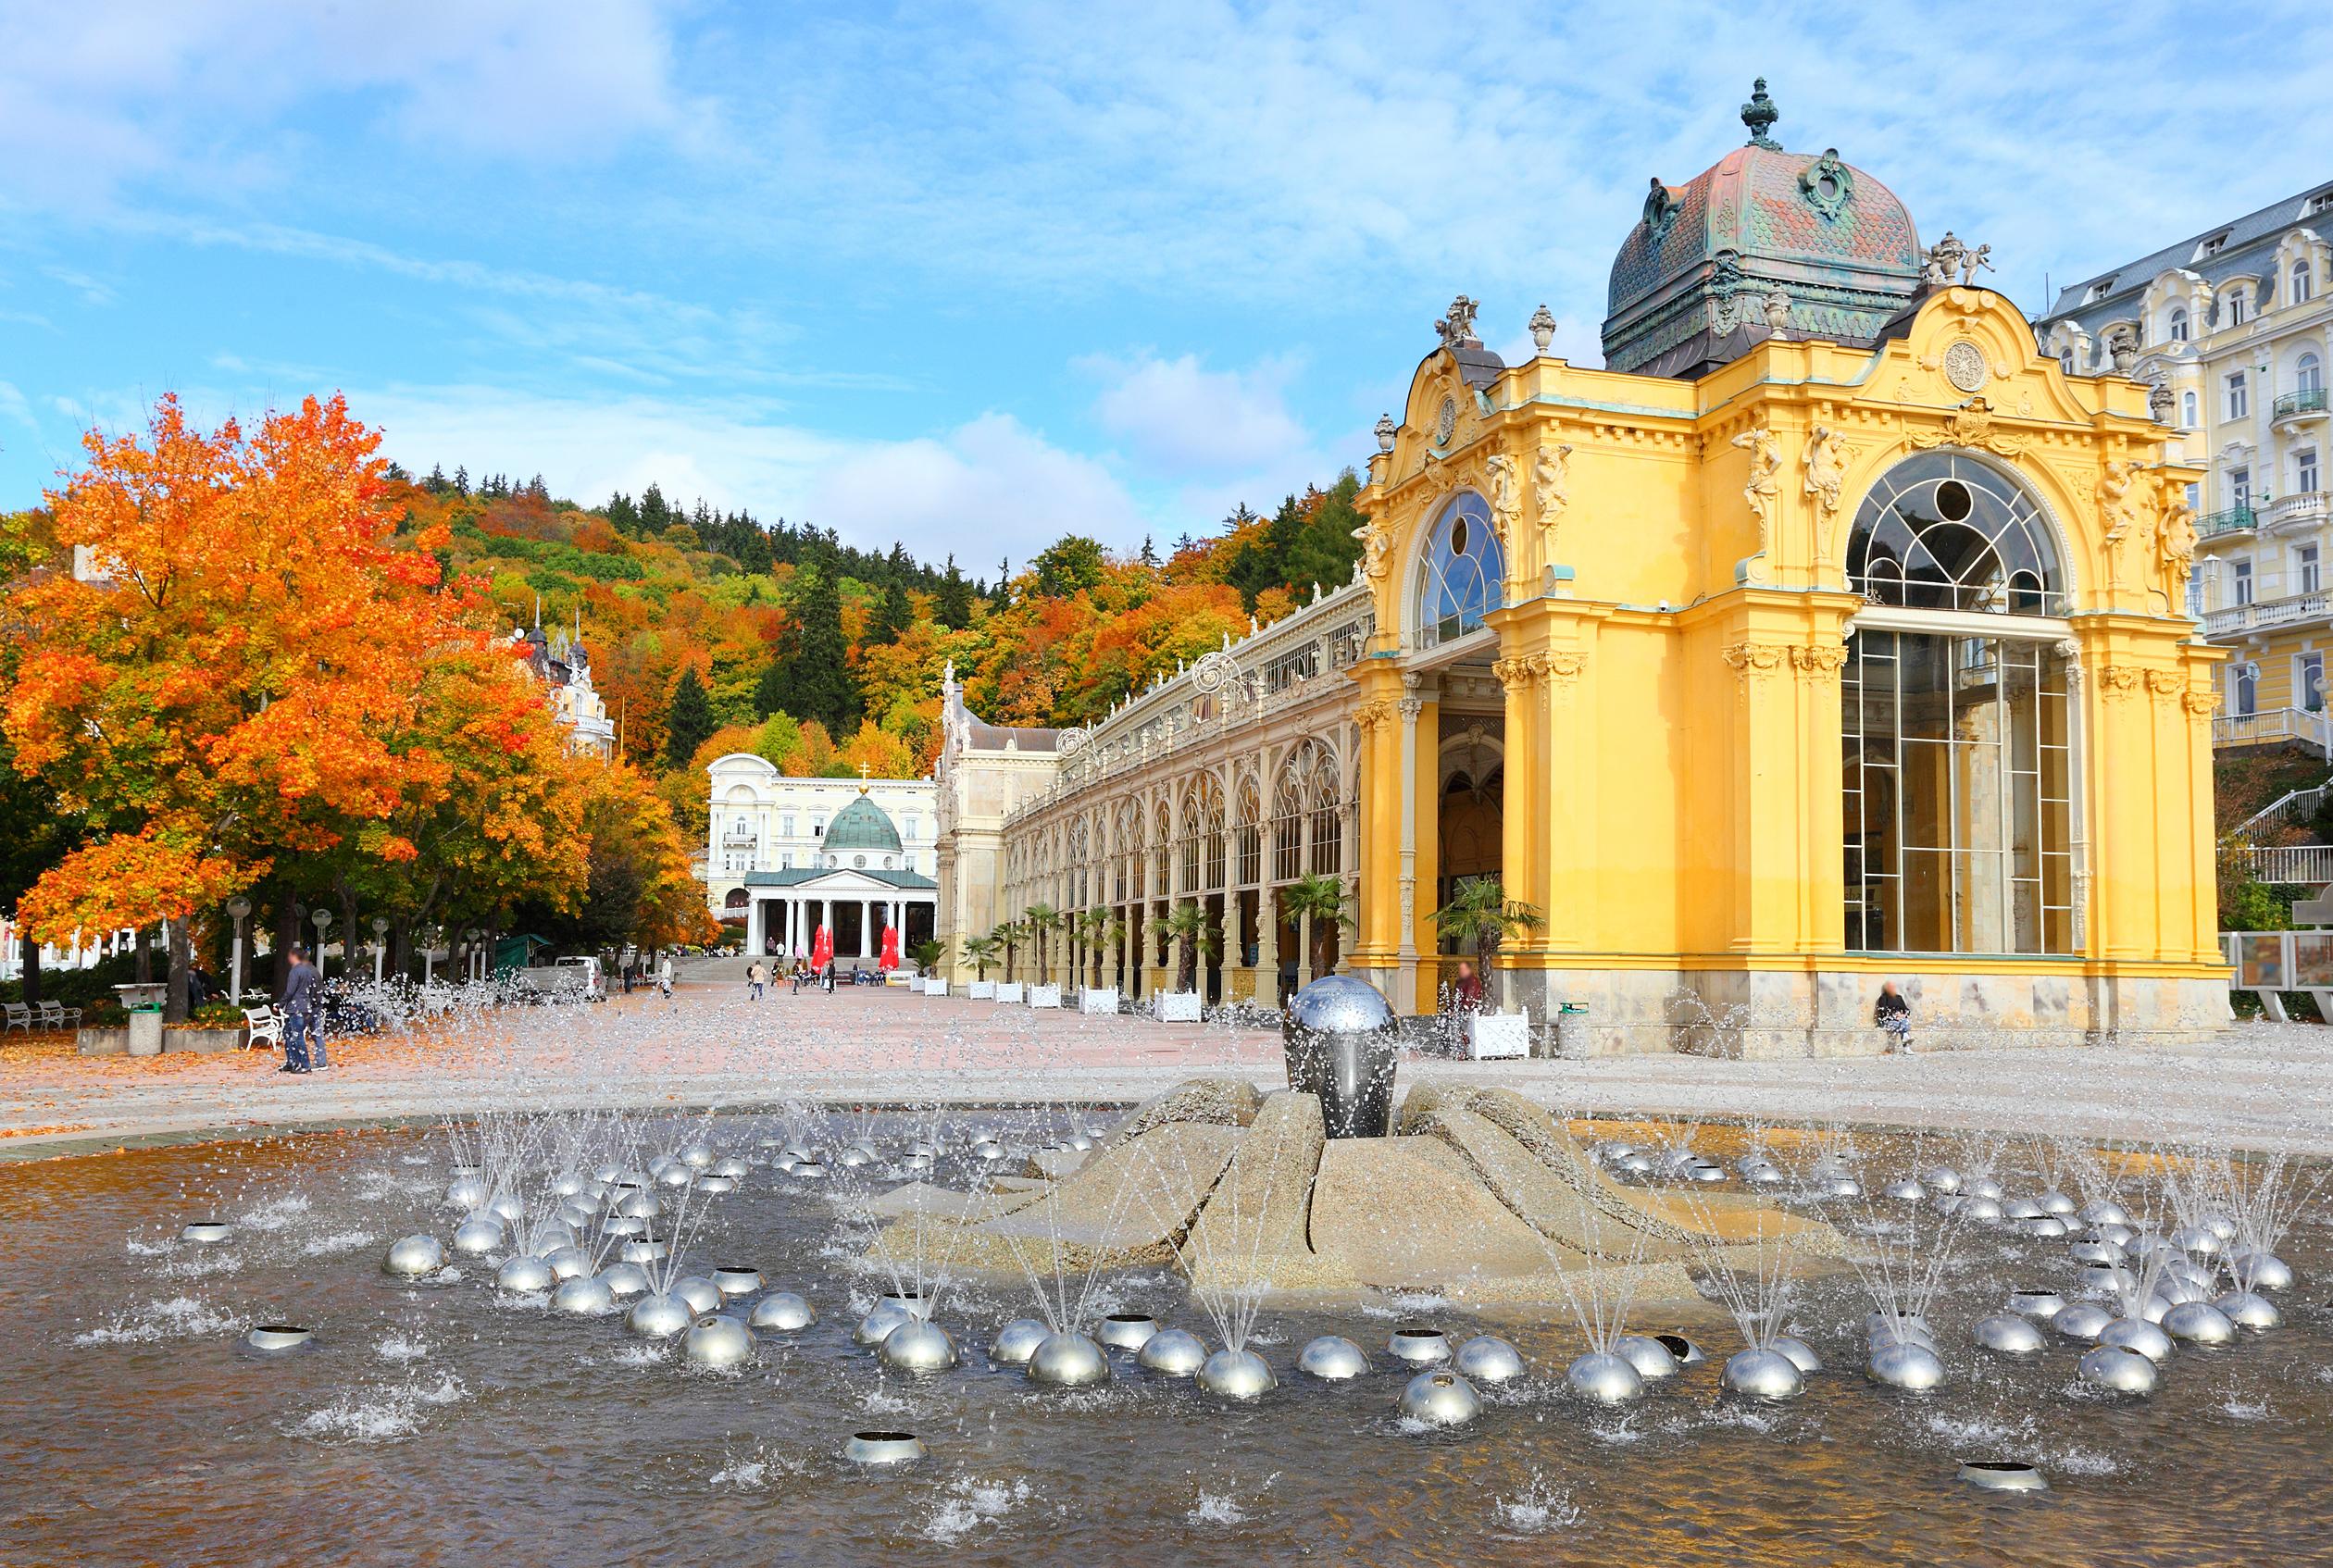 Karlovy Vary and Marianske Spa day trip from Prague